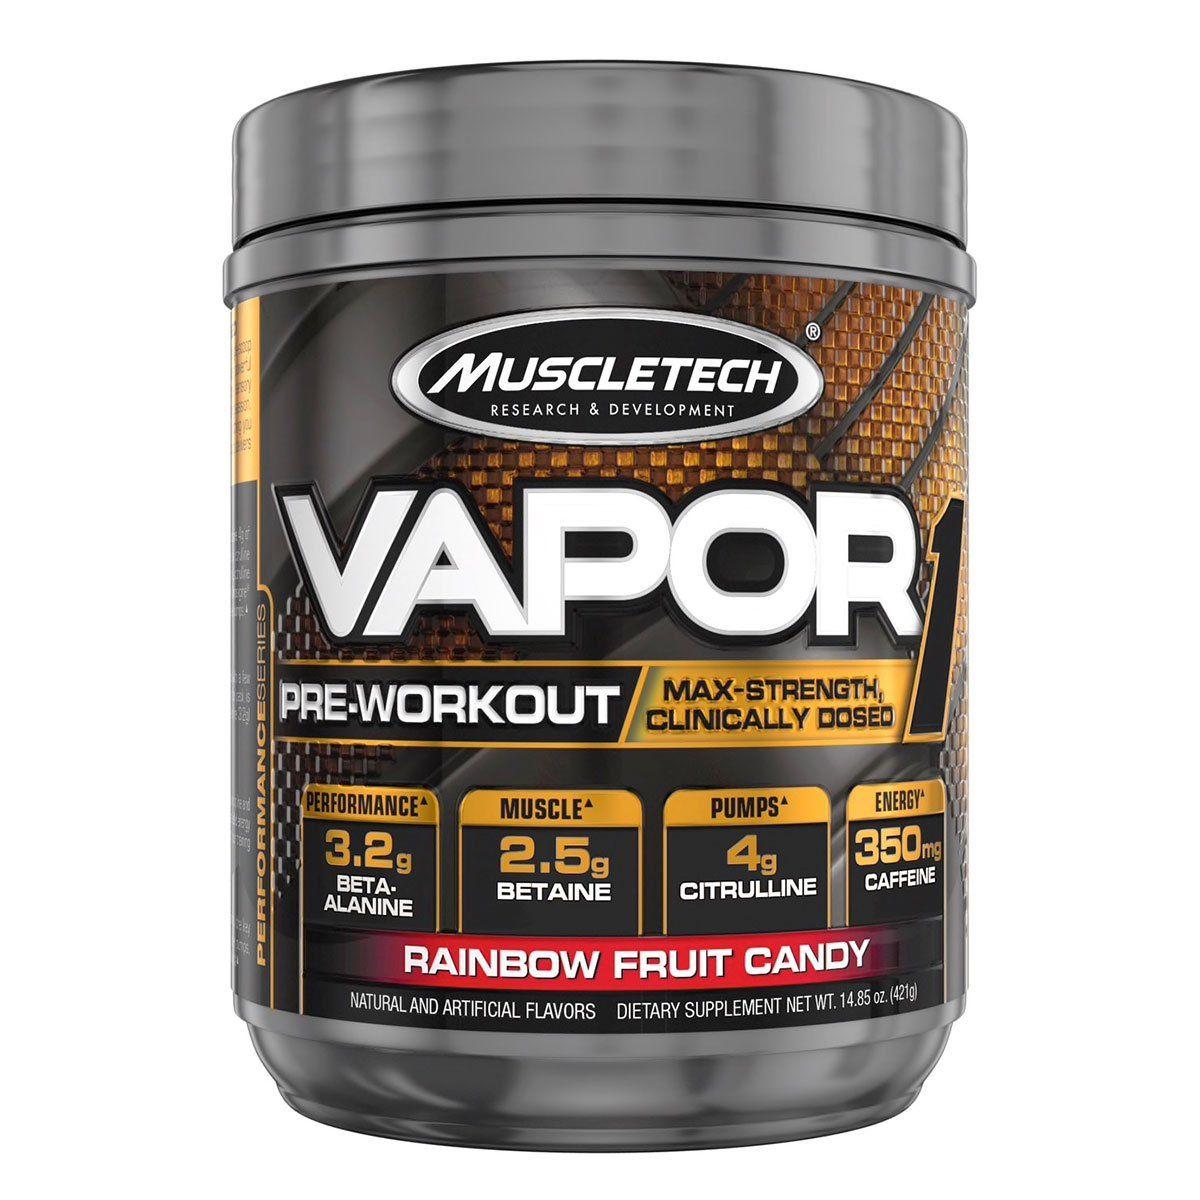 Vapor One Pre Workout 20 Servings Rainbow Fruit Candy Preworkout Muscletech Rainbow Fruit